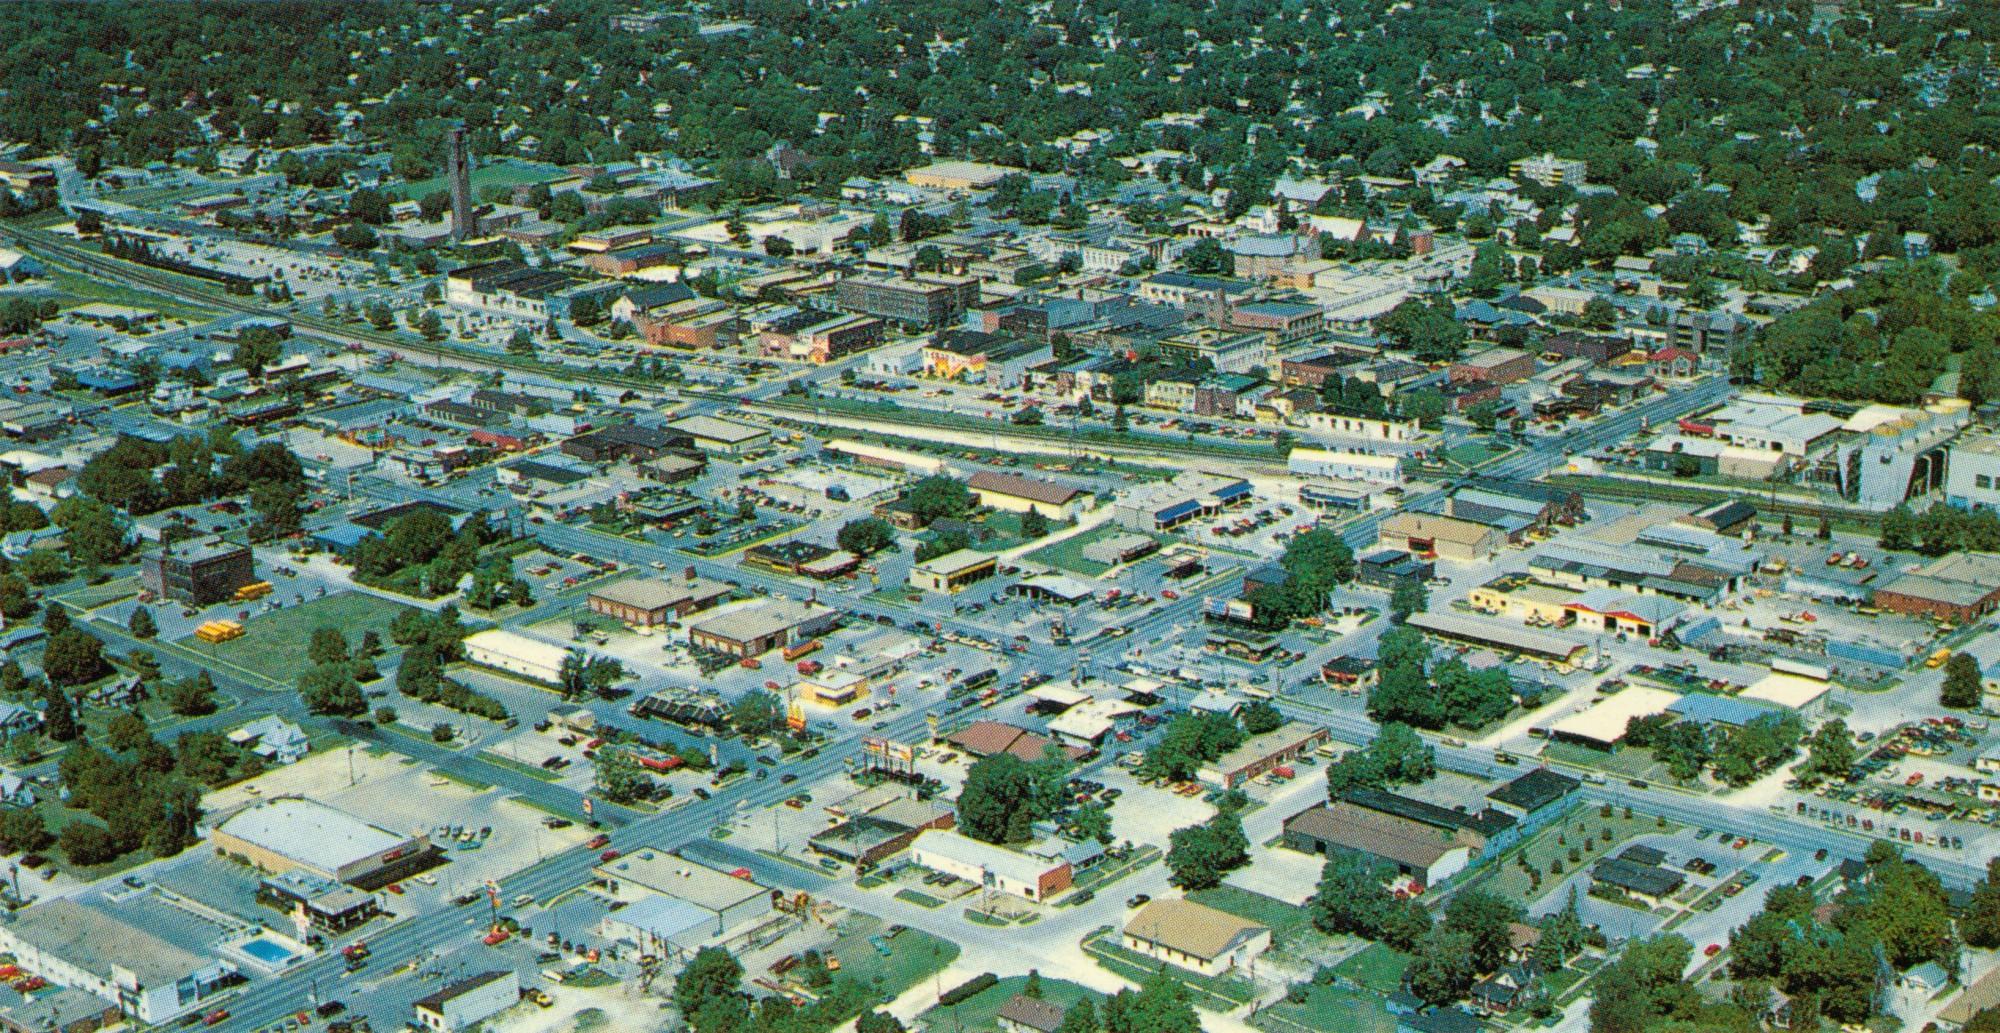 Aerial Views | Ames Historical Society